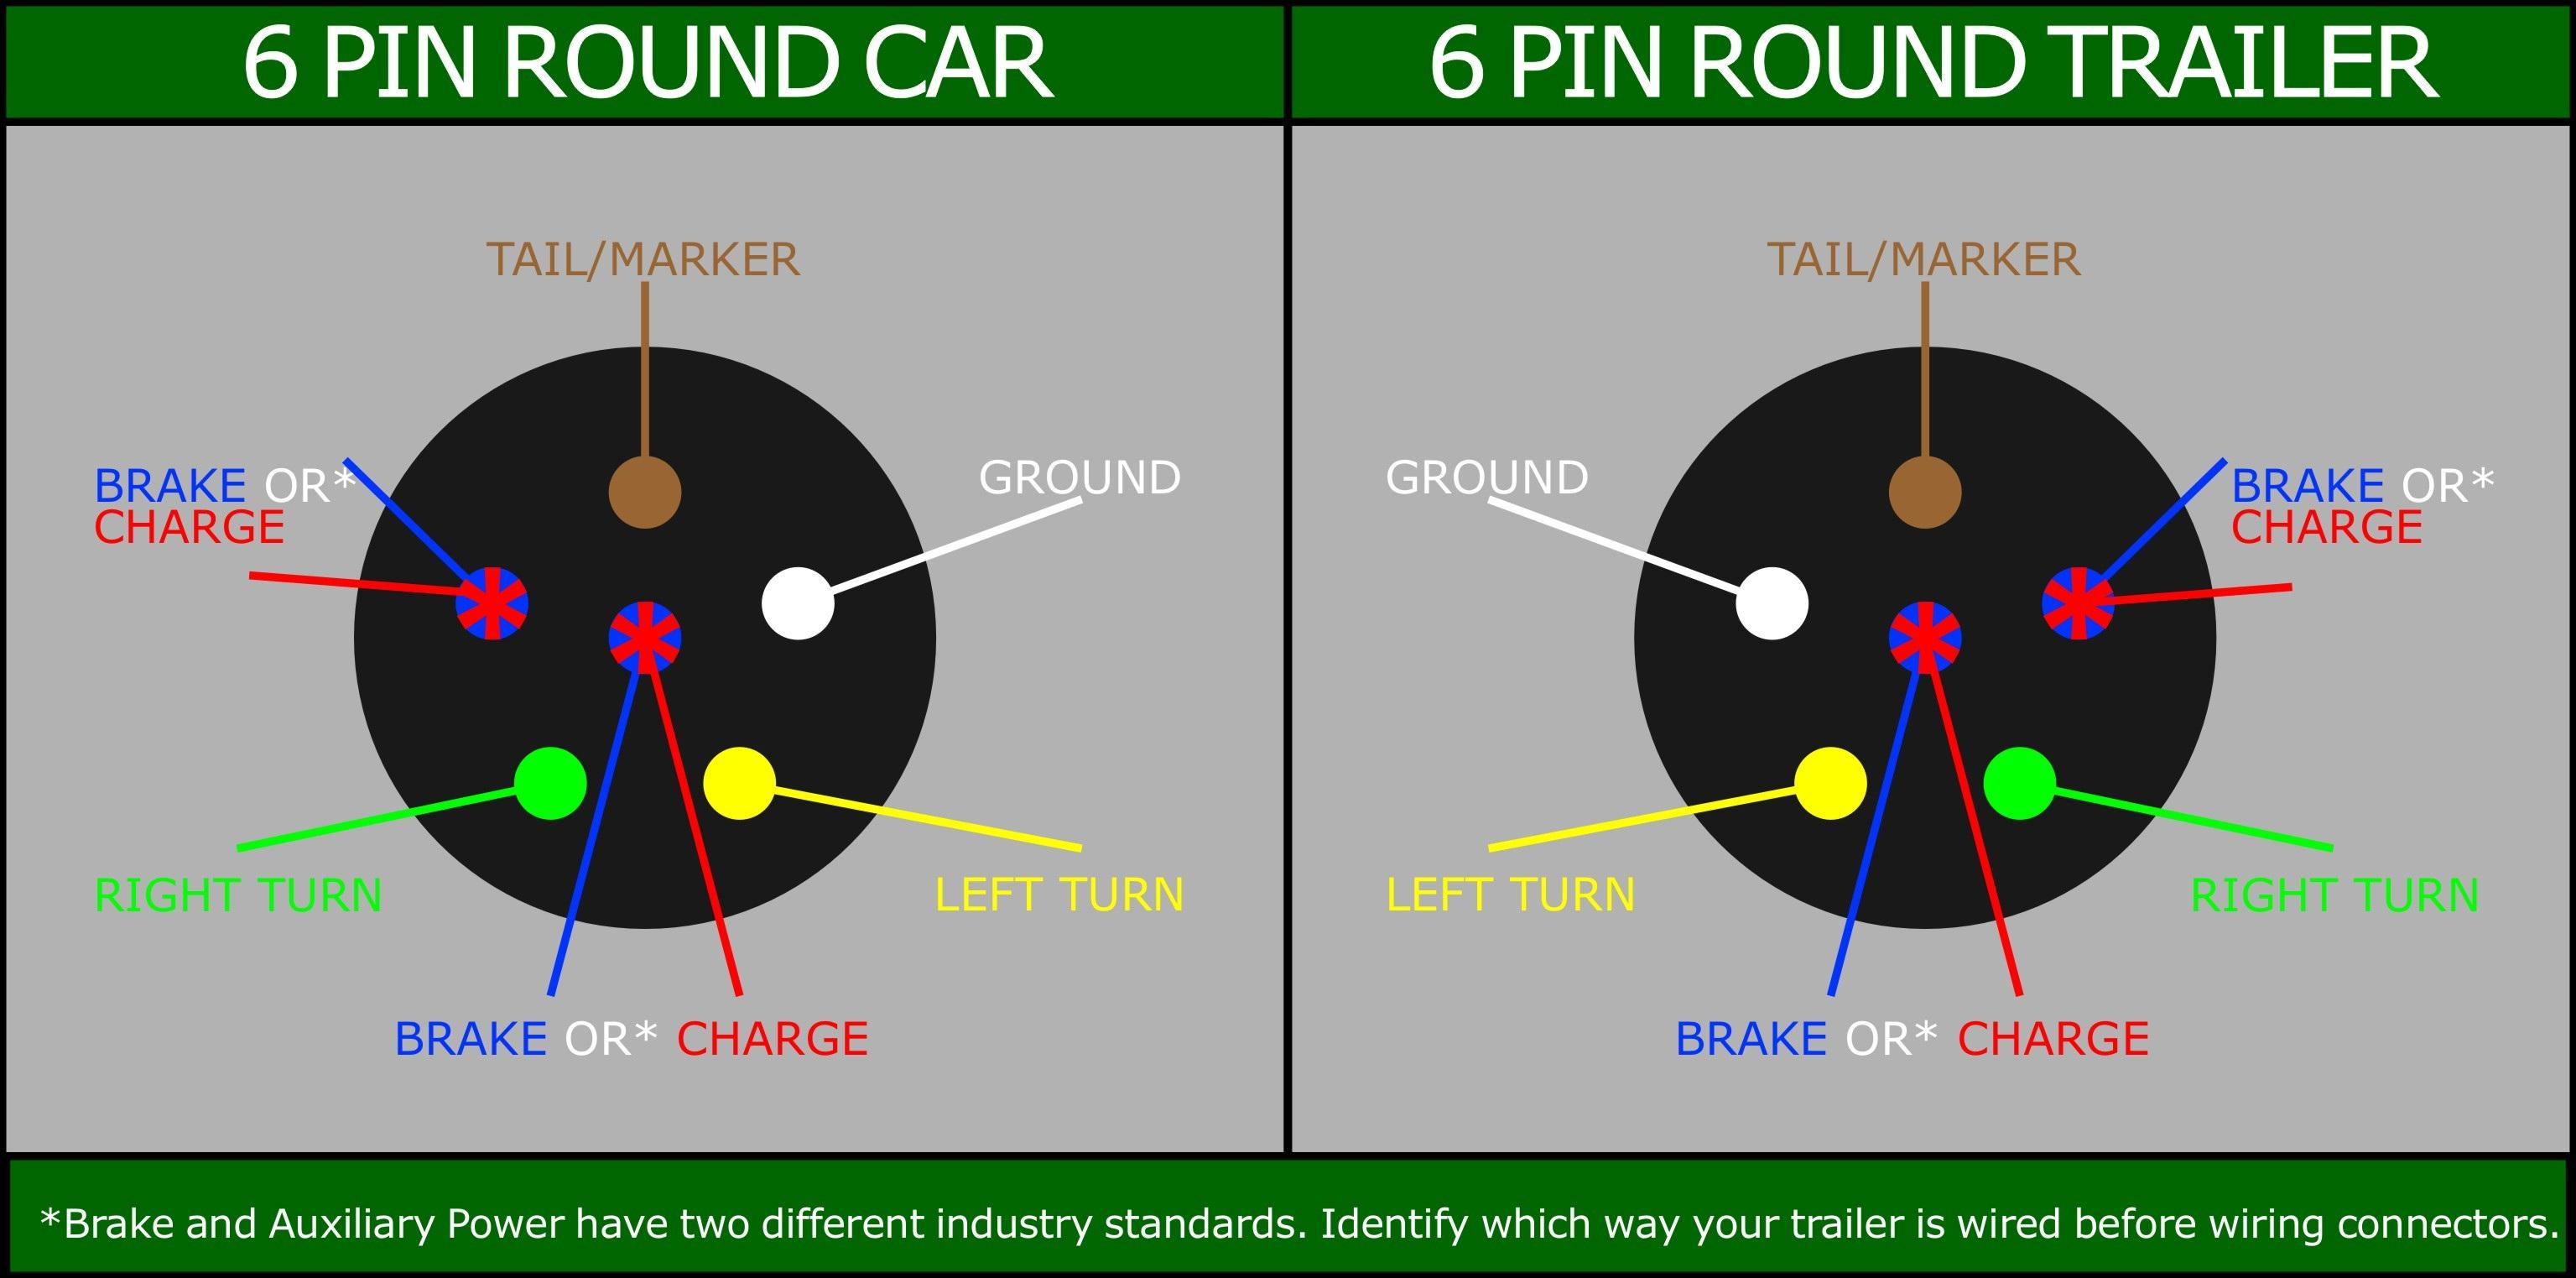 6 Pin Trailer Wiring Harness Diagram - Data Wiring Diagram Today - 6 Pin Wiring Diagram